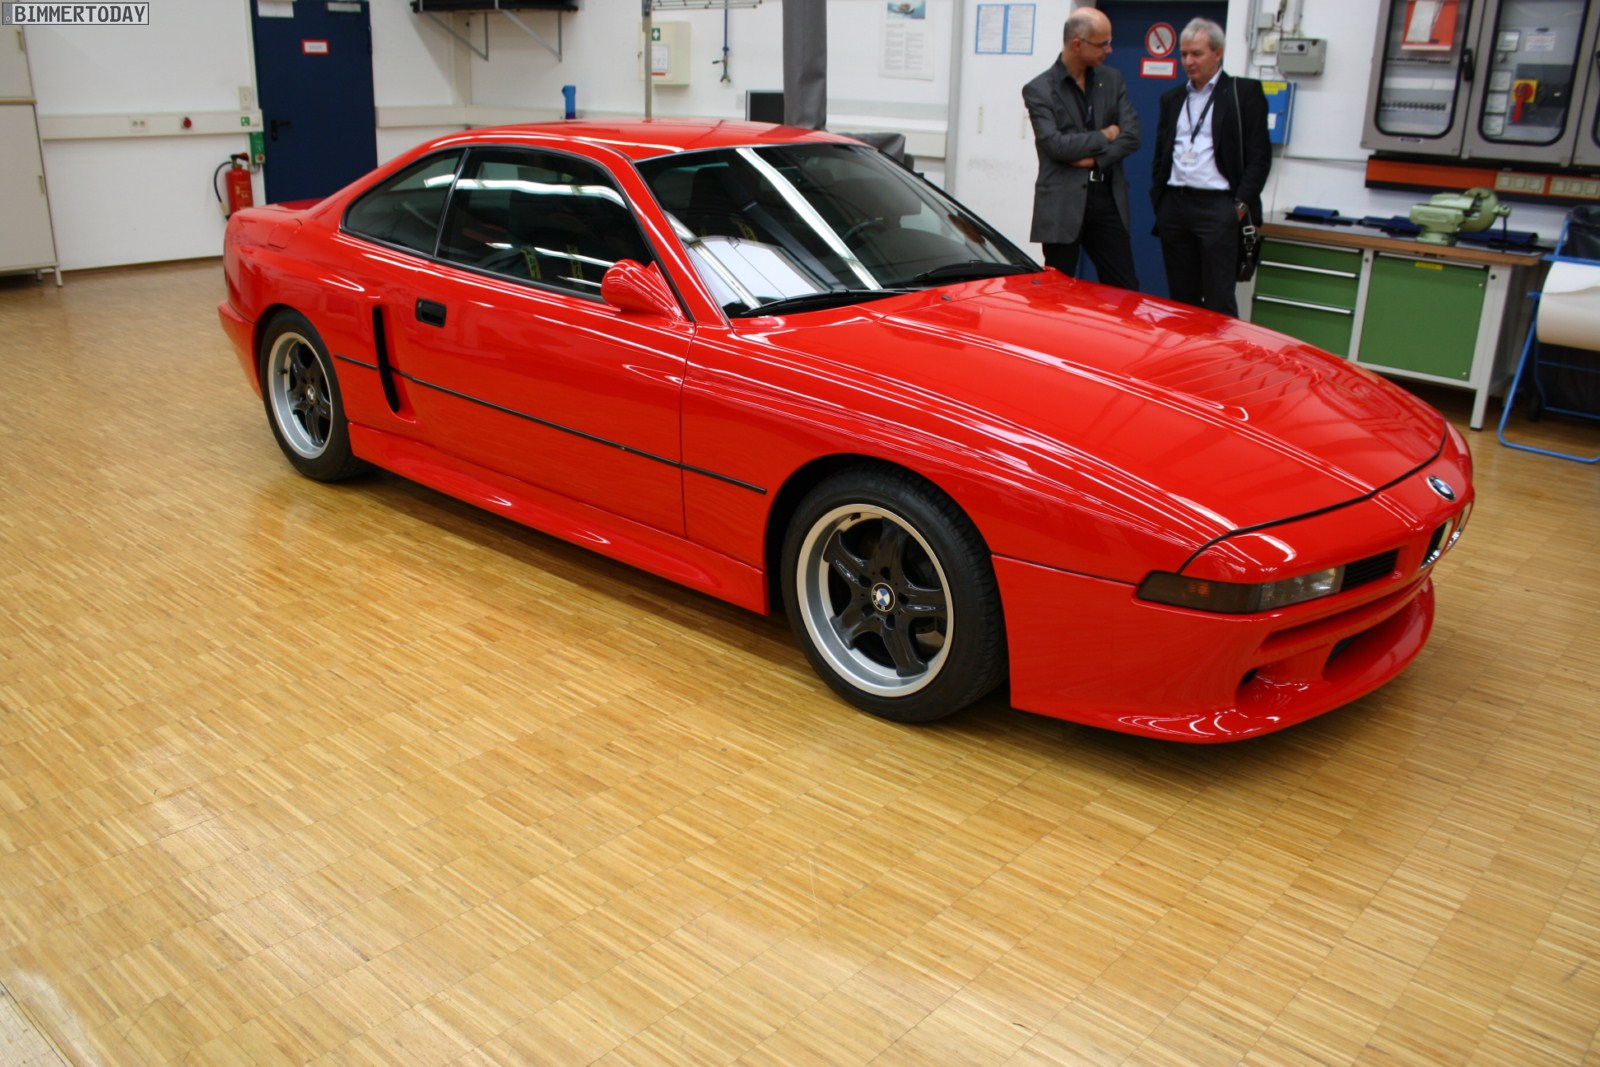 Bmw M8 E31 1990 Old Concept Cars